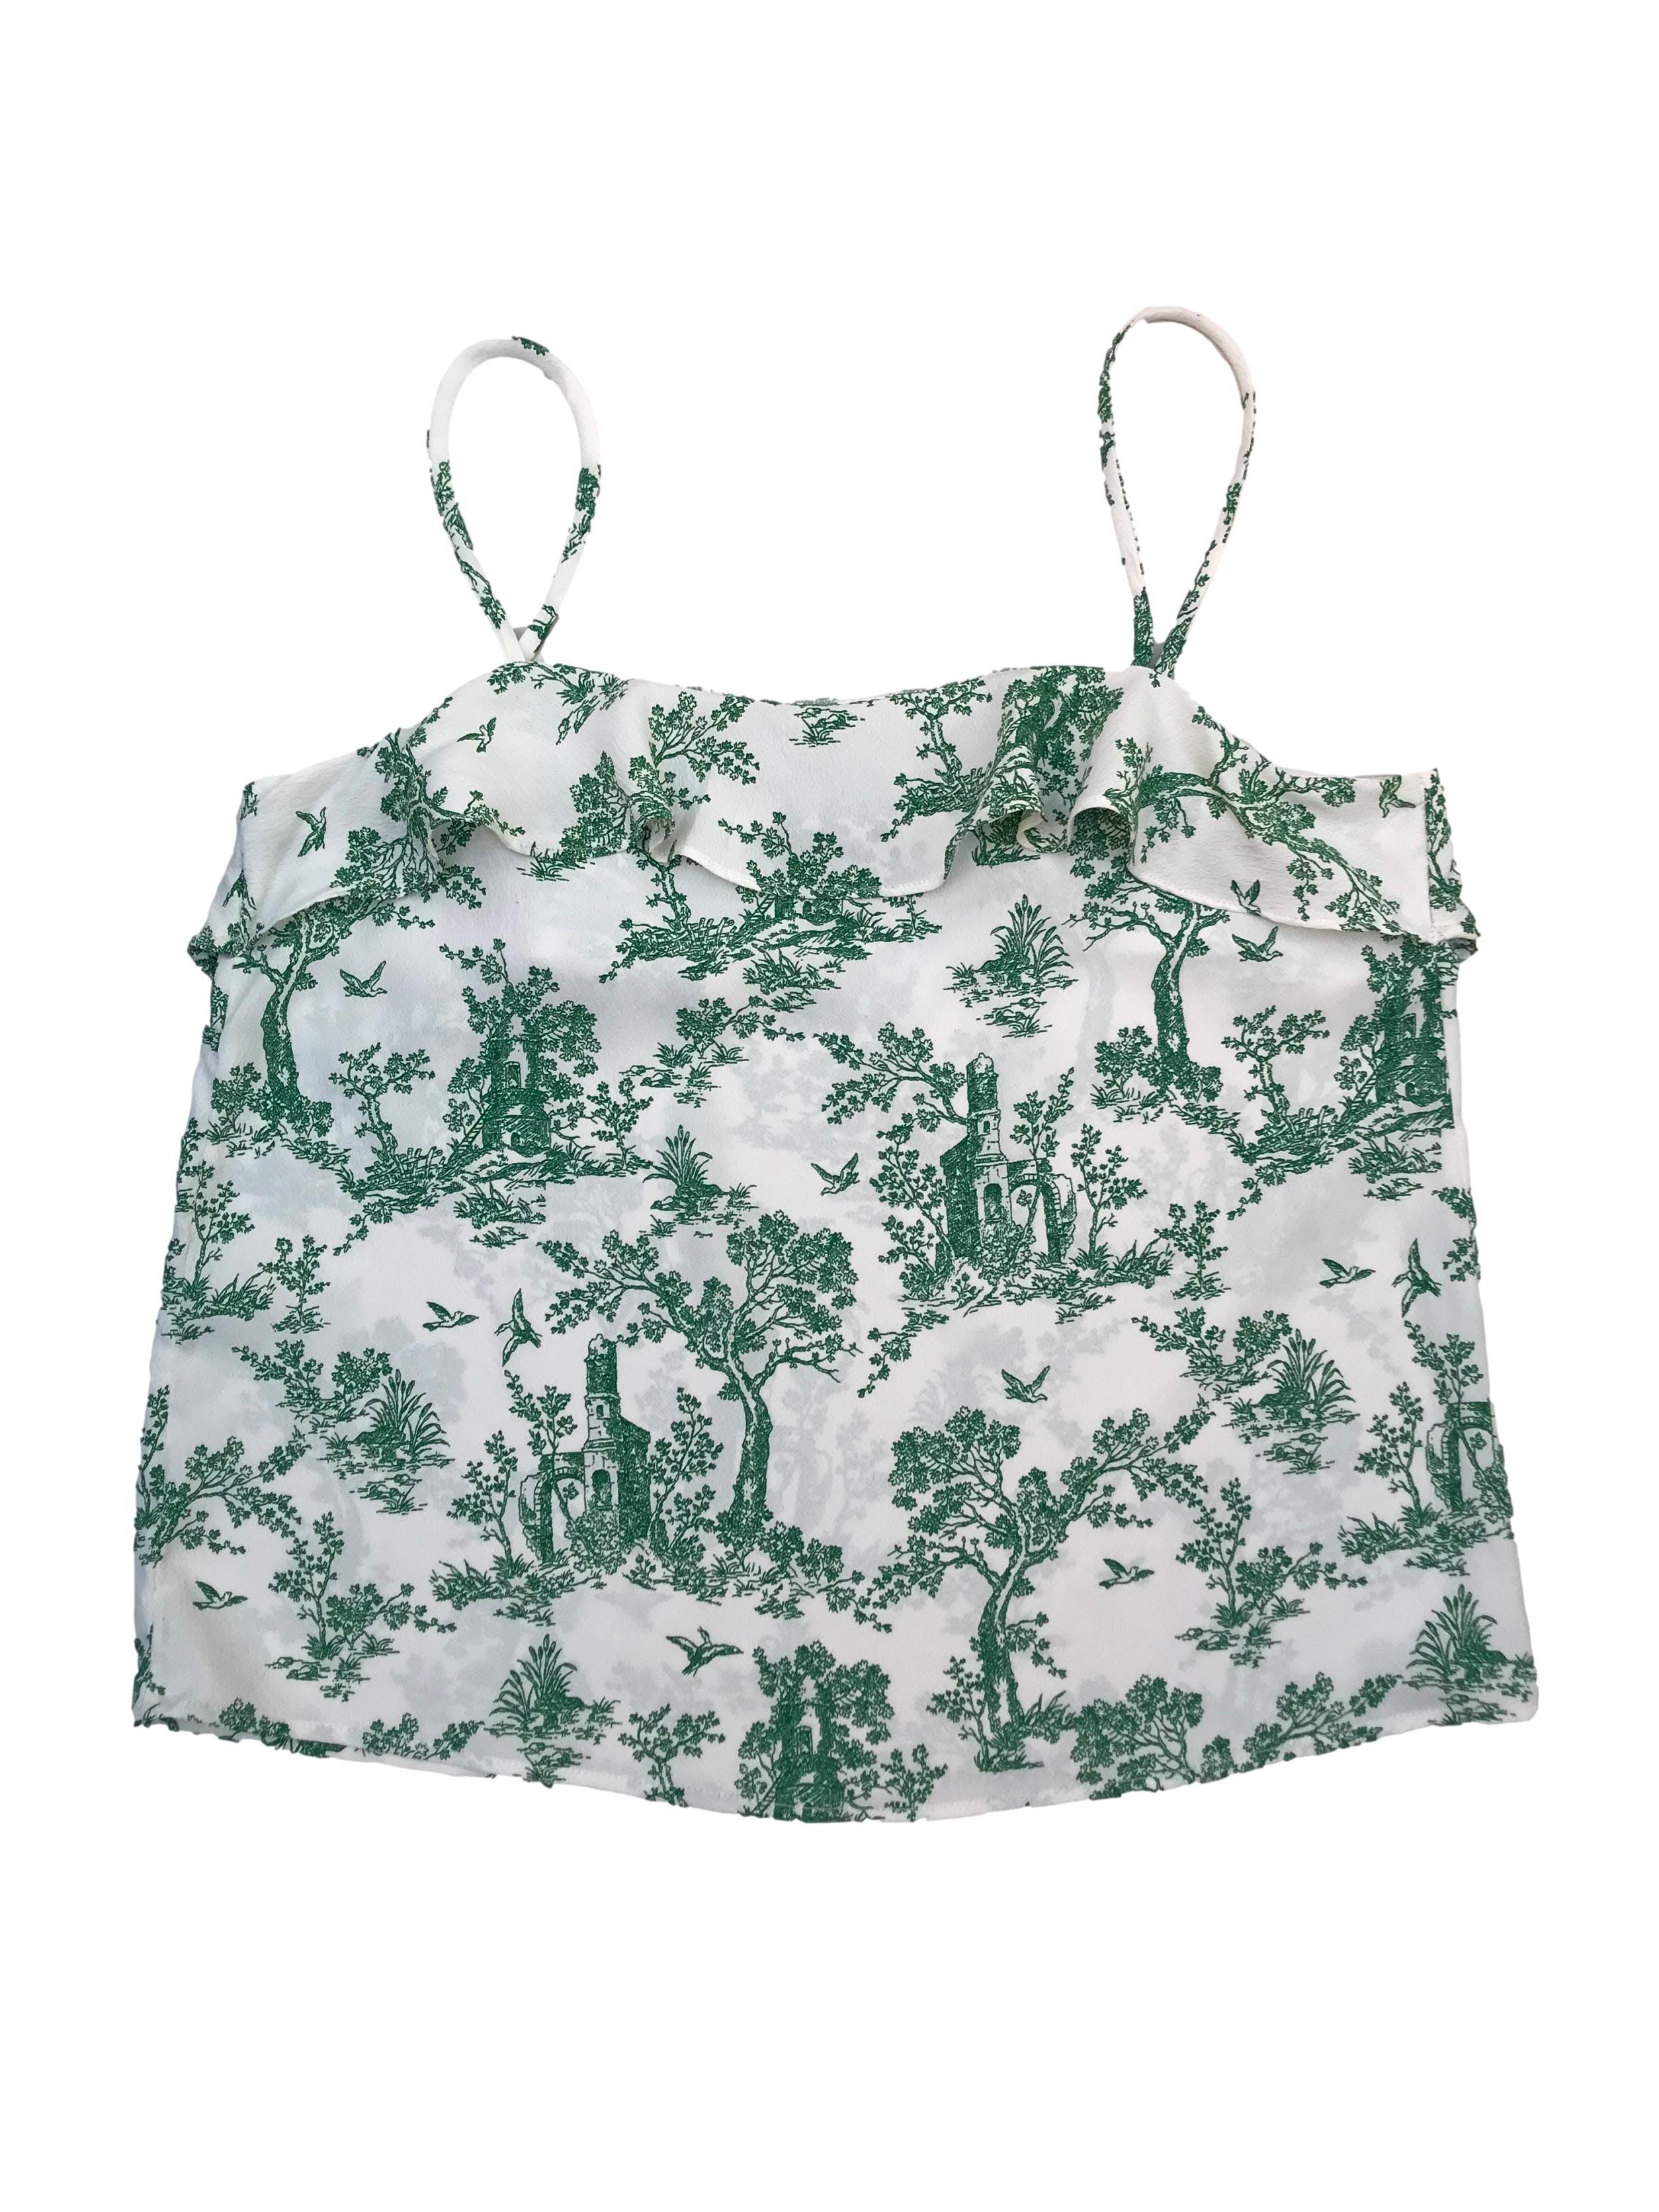 Blusa H&M con volante superior, tela plana blanca con print verde. Busto 90cm Largo desde sisa 34cm